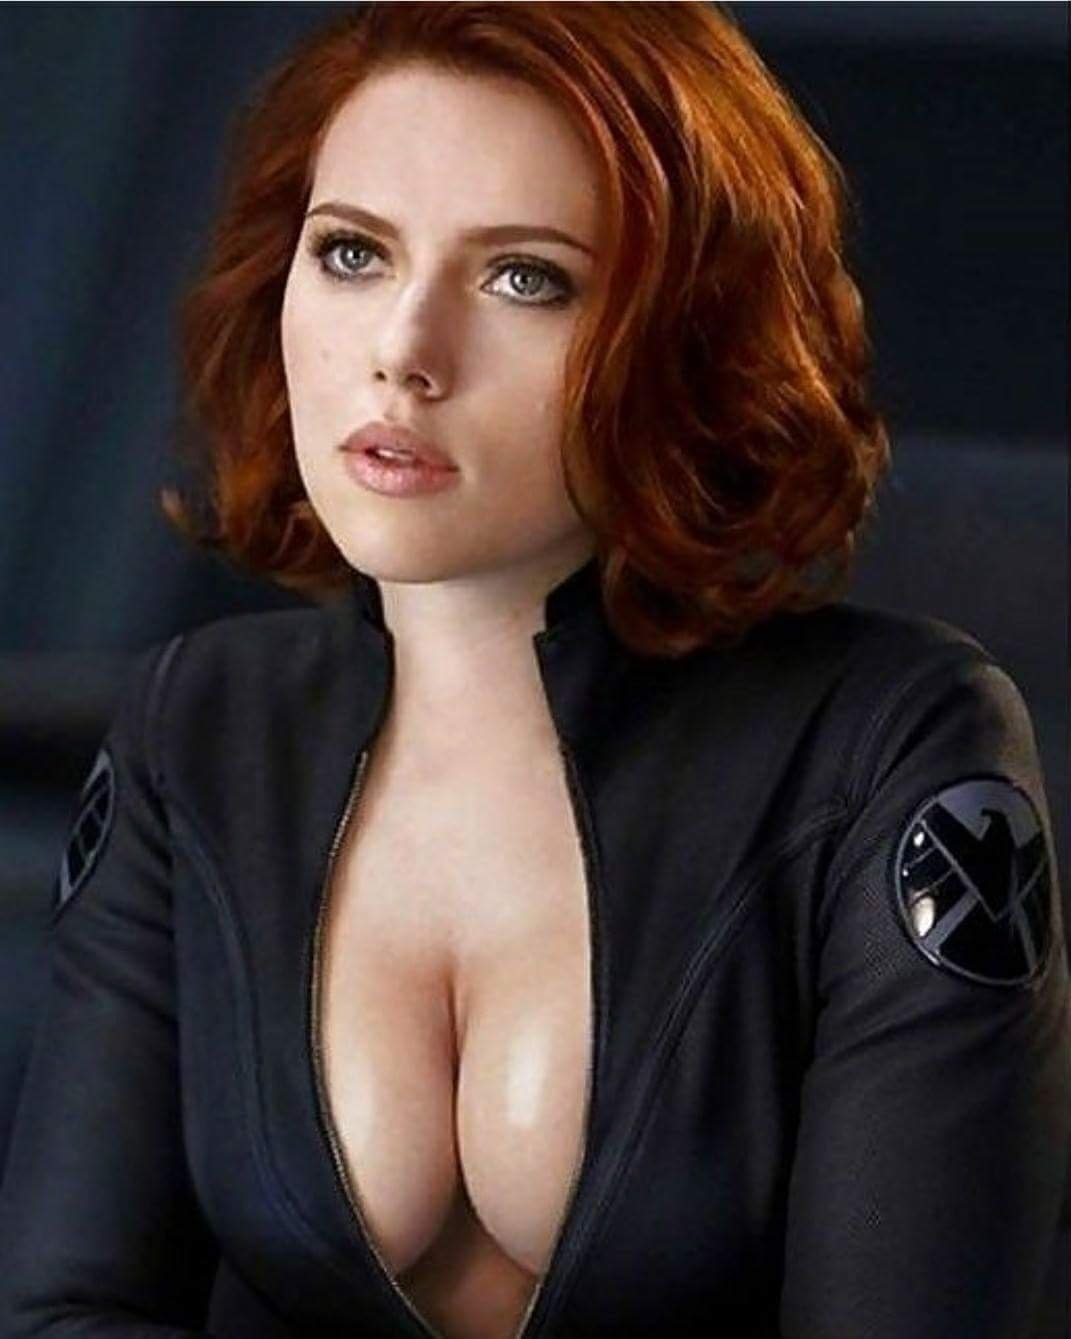 Scarlett johansson is a sexy drug mule superhero in ilucyi trailer